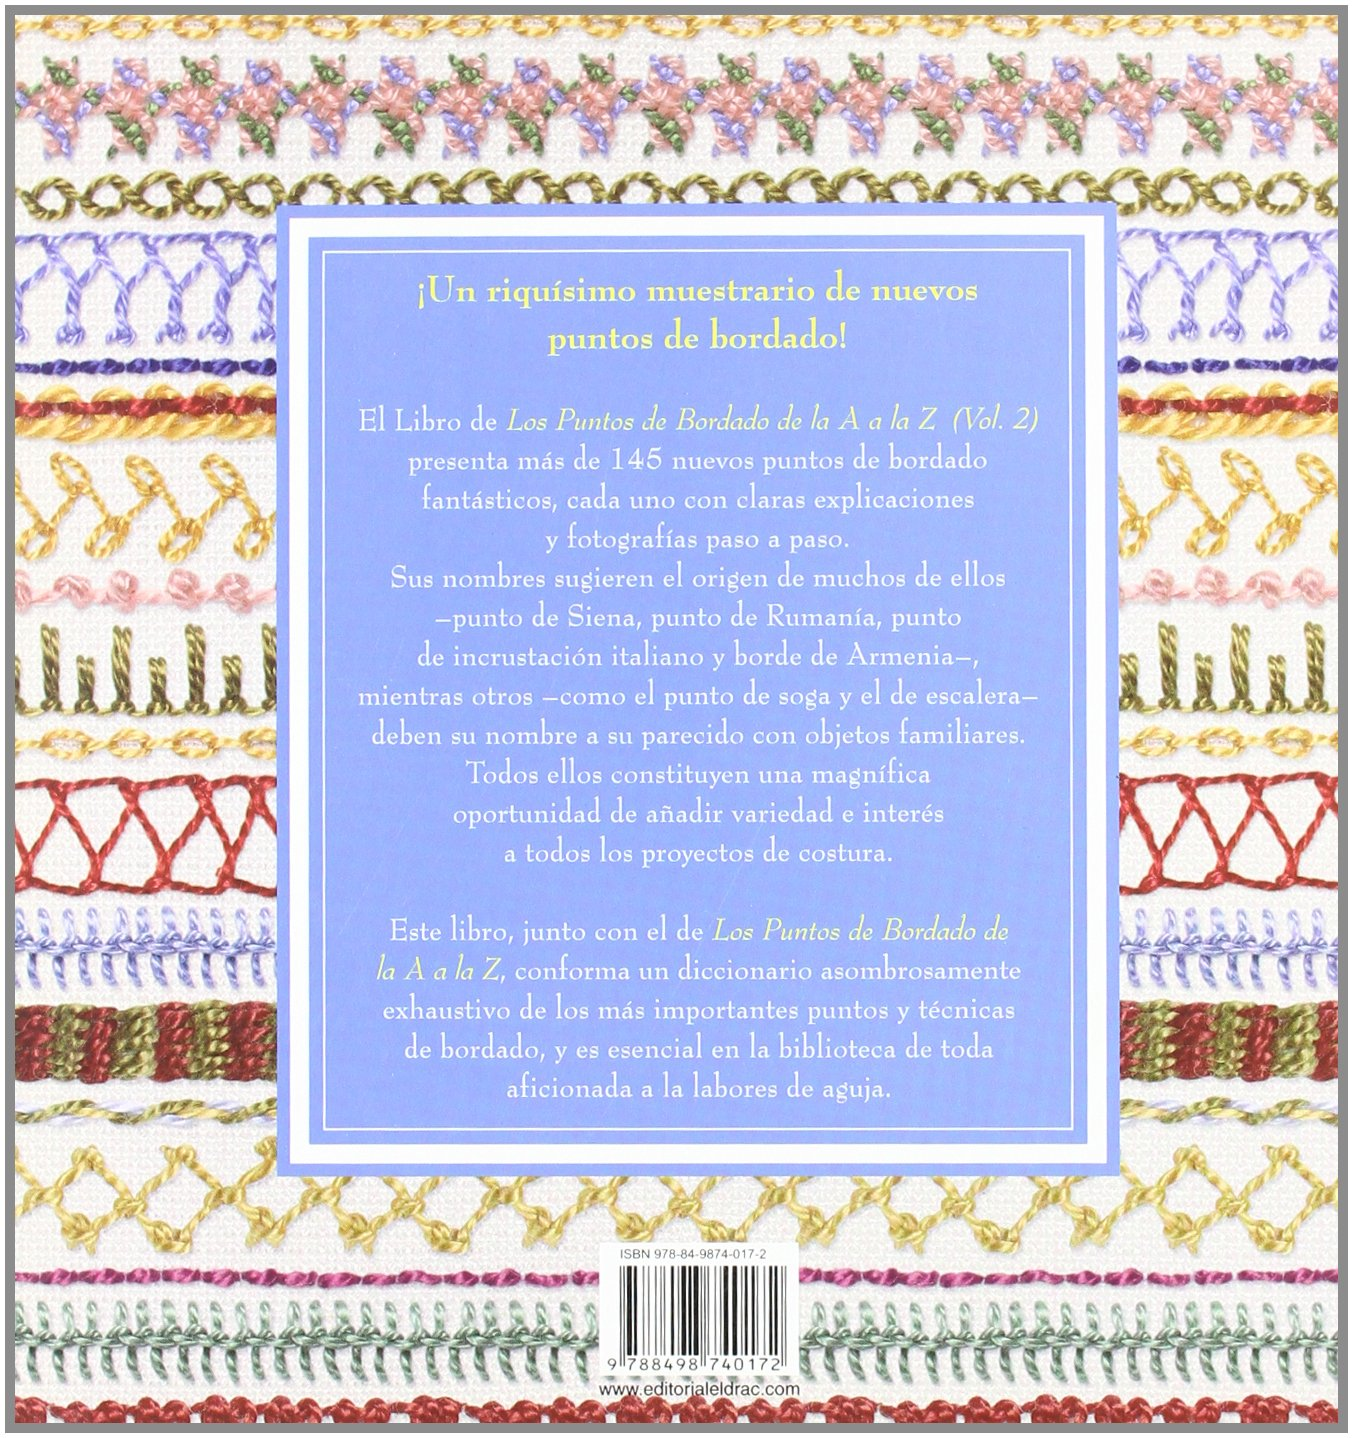 Los puntos de bordado de la A a la Z / A to Z of Embroidery Stitches (El Libro De / the Book of) (Spanish Edition): Susan OConnor, Ana Maria Aznar: ...